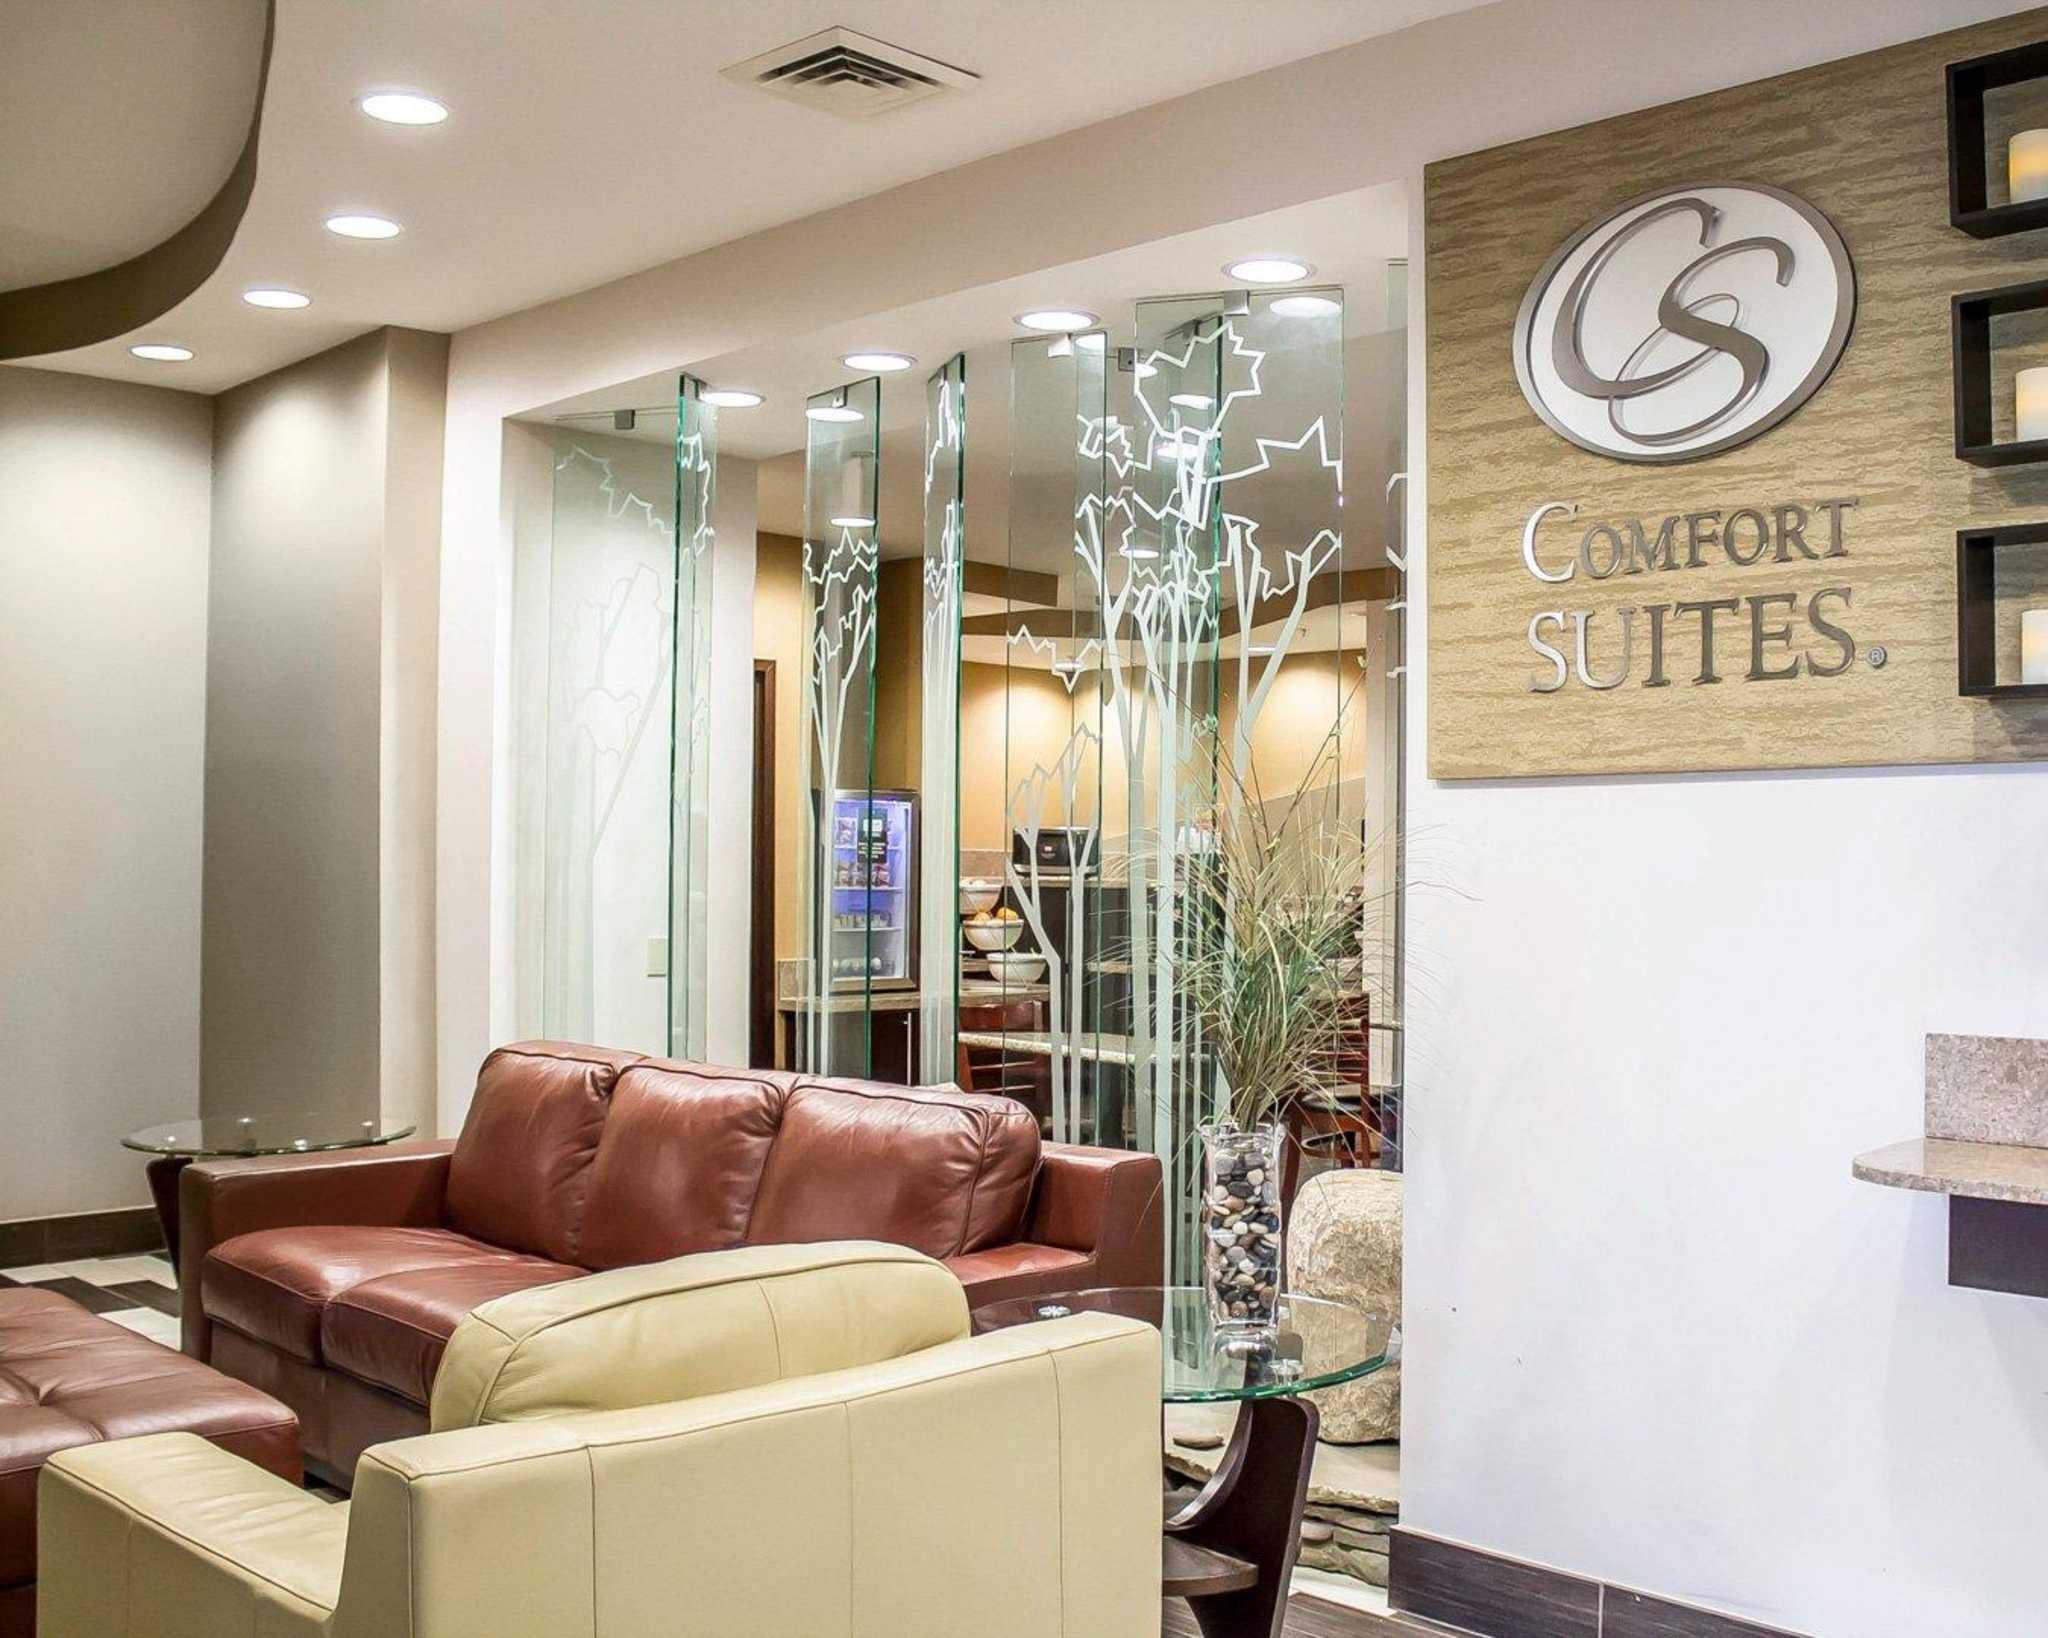 Comfort Suites Perrysburg - Toledo South image 9